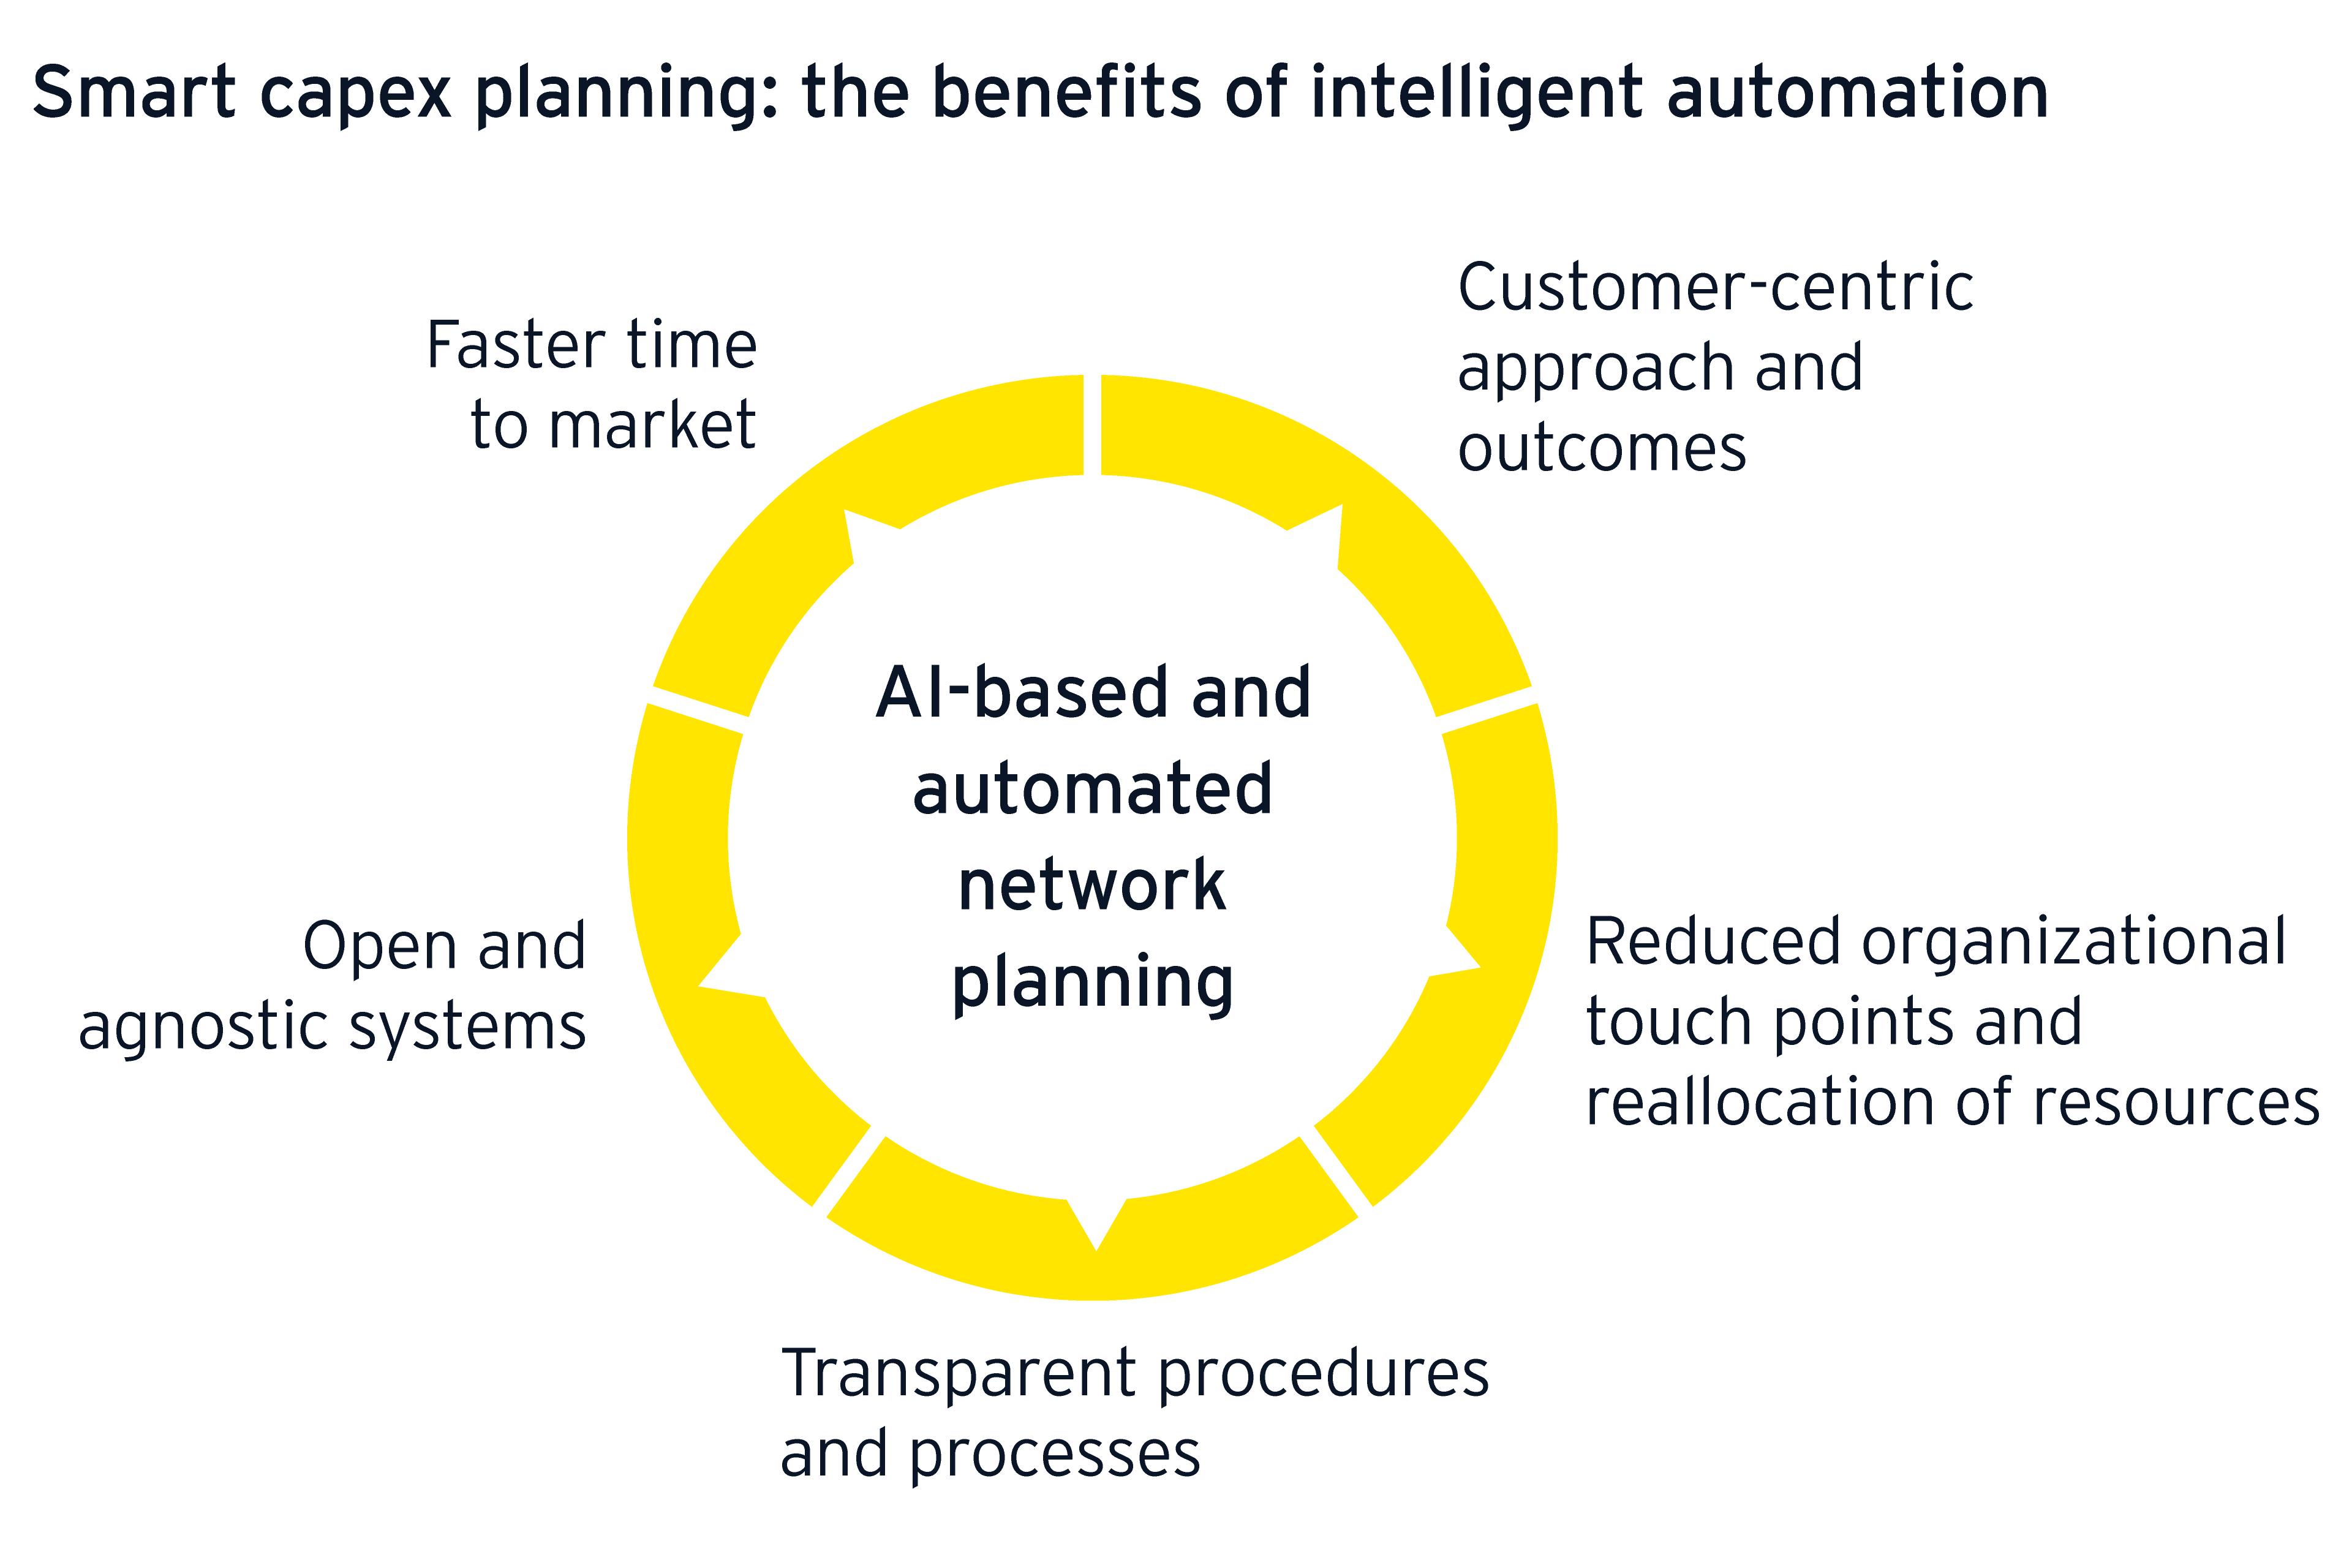 Smart capex planning